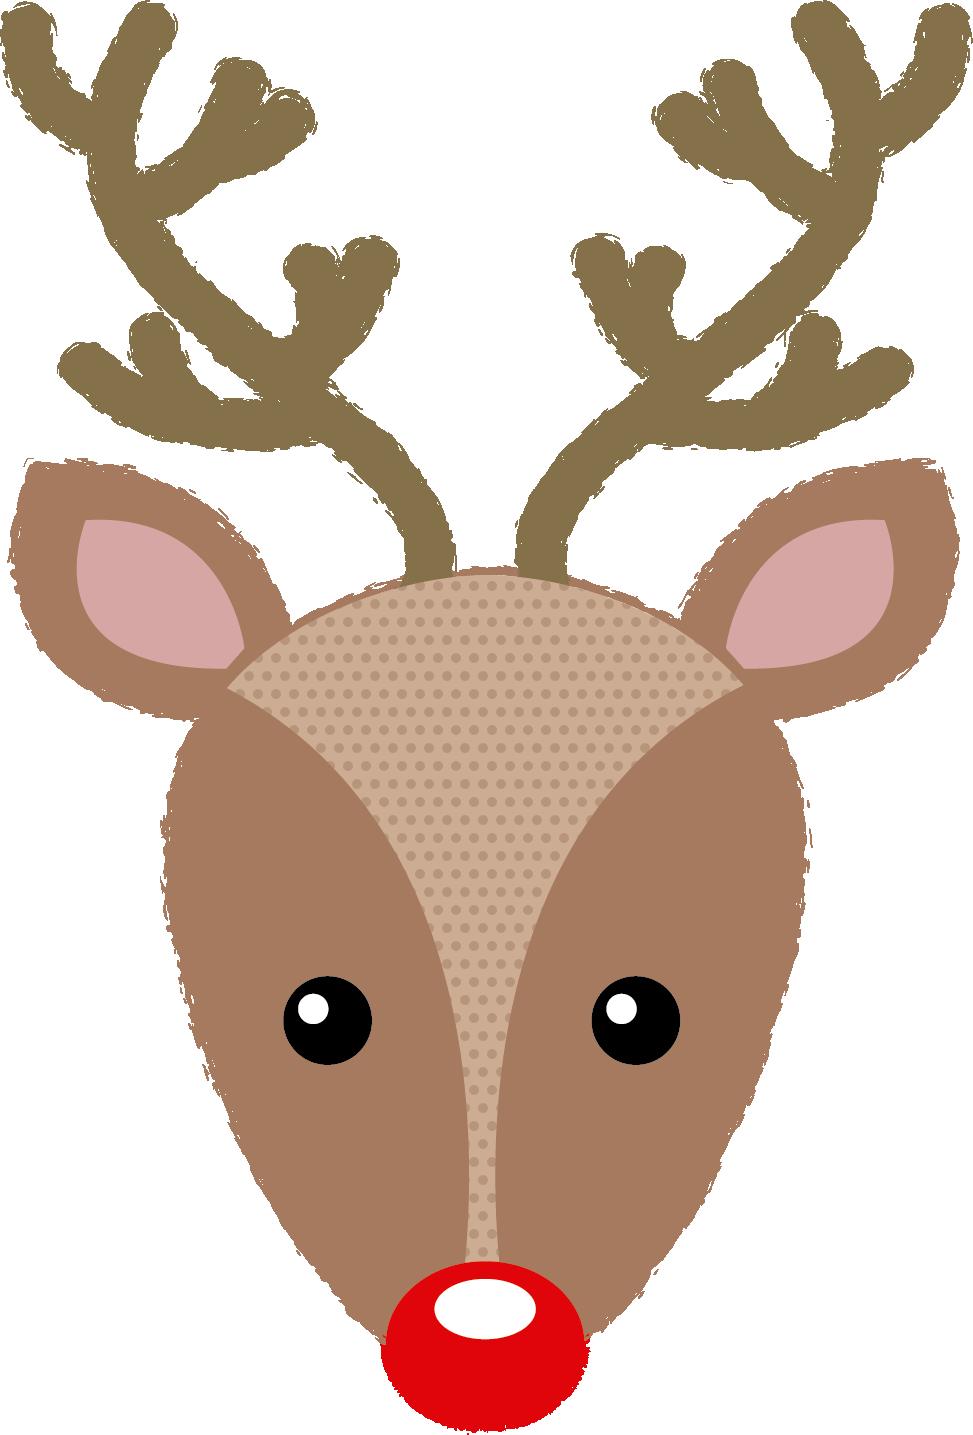 Winter wonderland reindeeristocksketchpng. Games clipart reindeer game